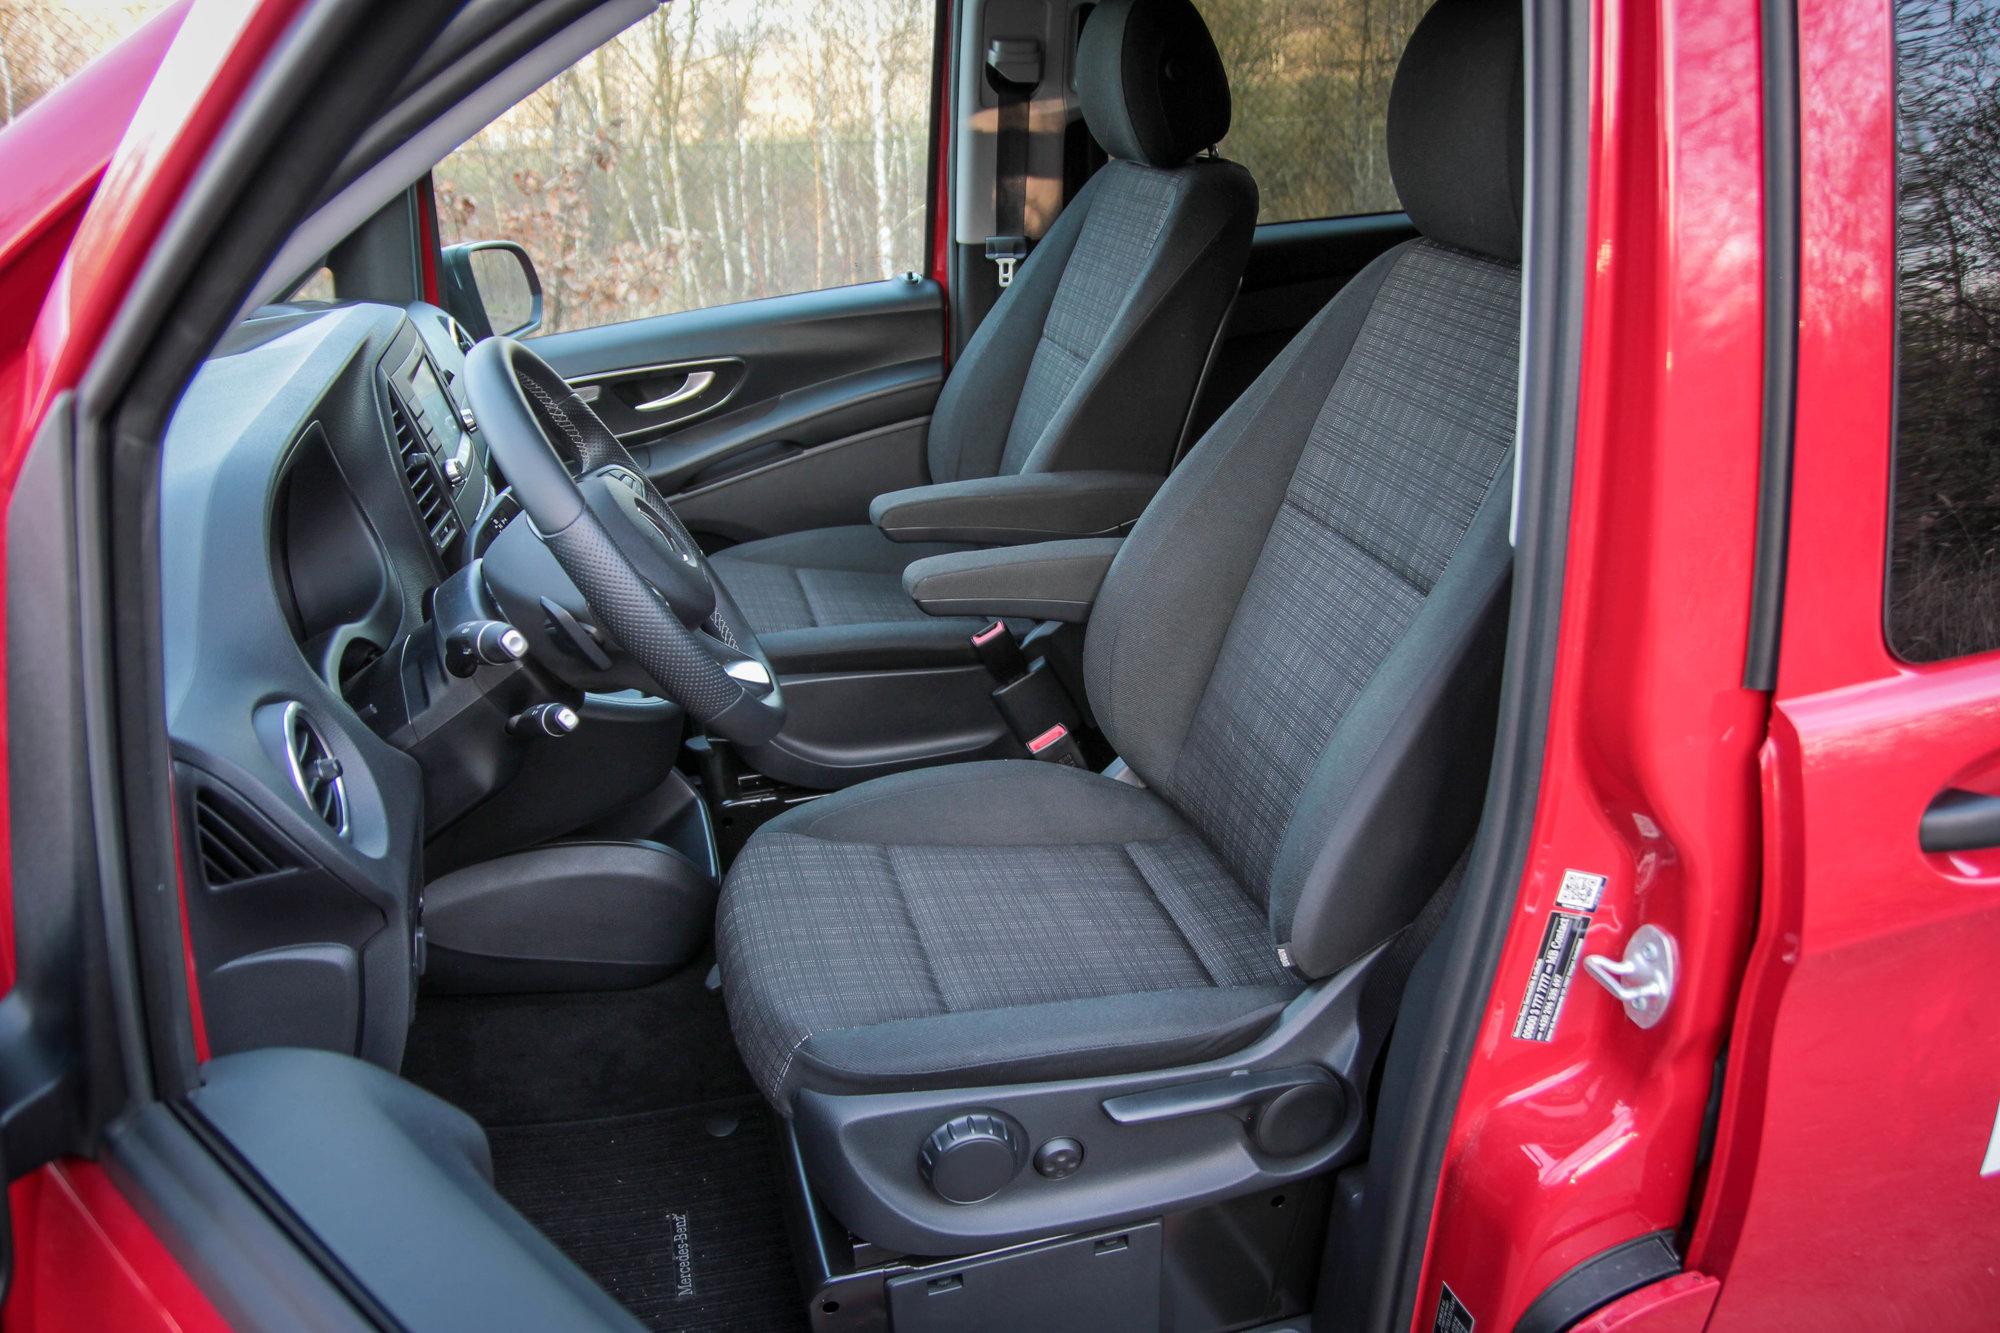 Mercedes-Benz Vito Family